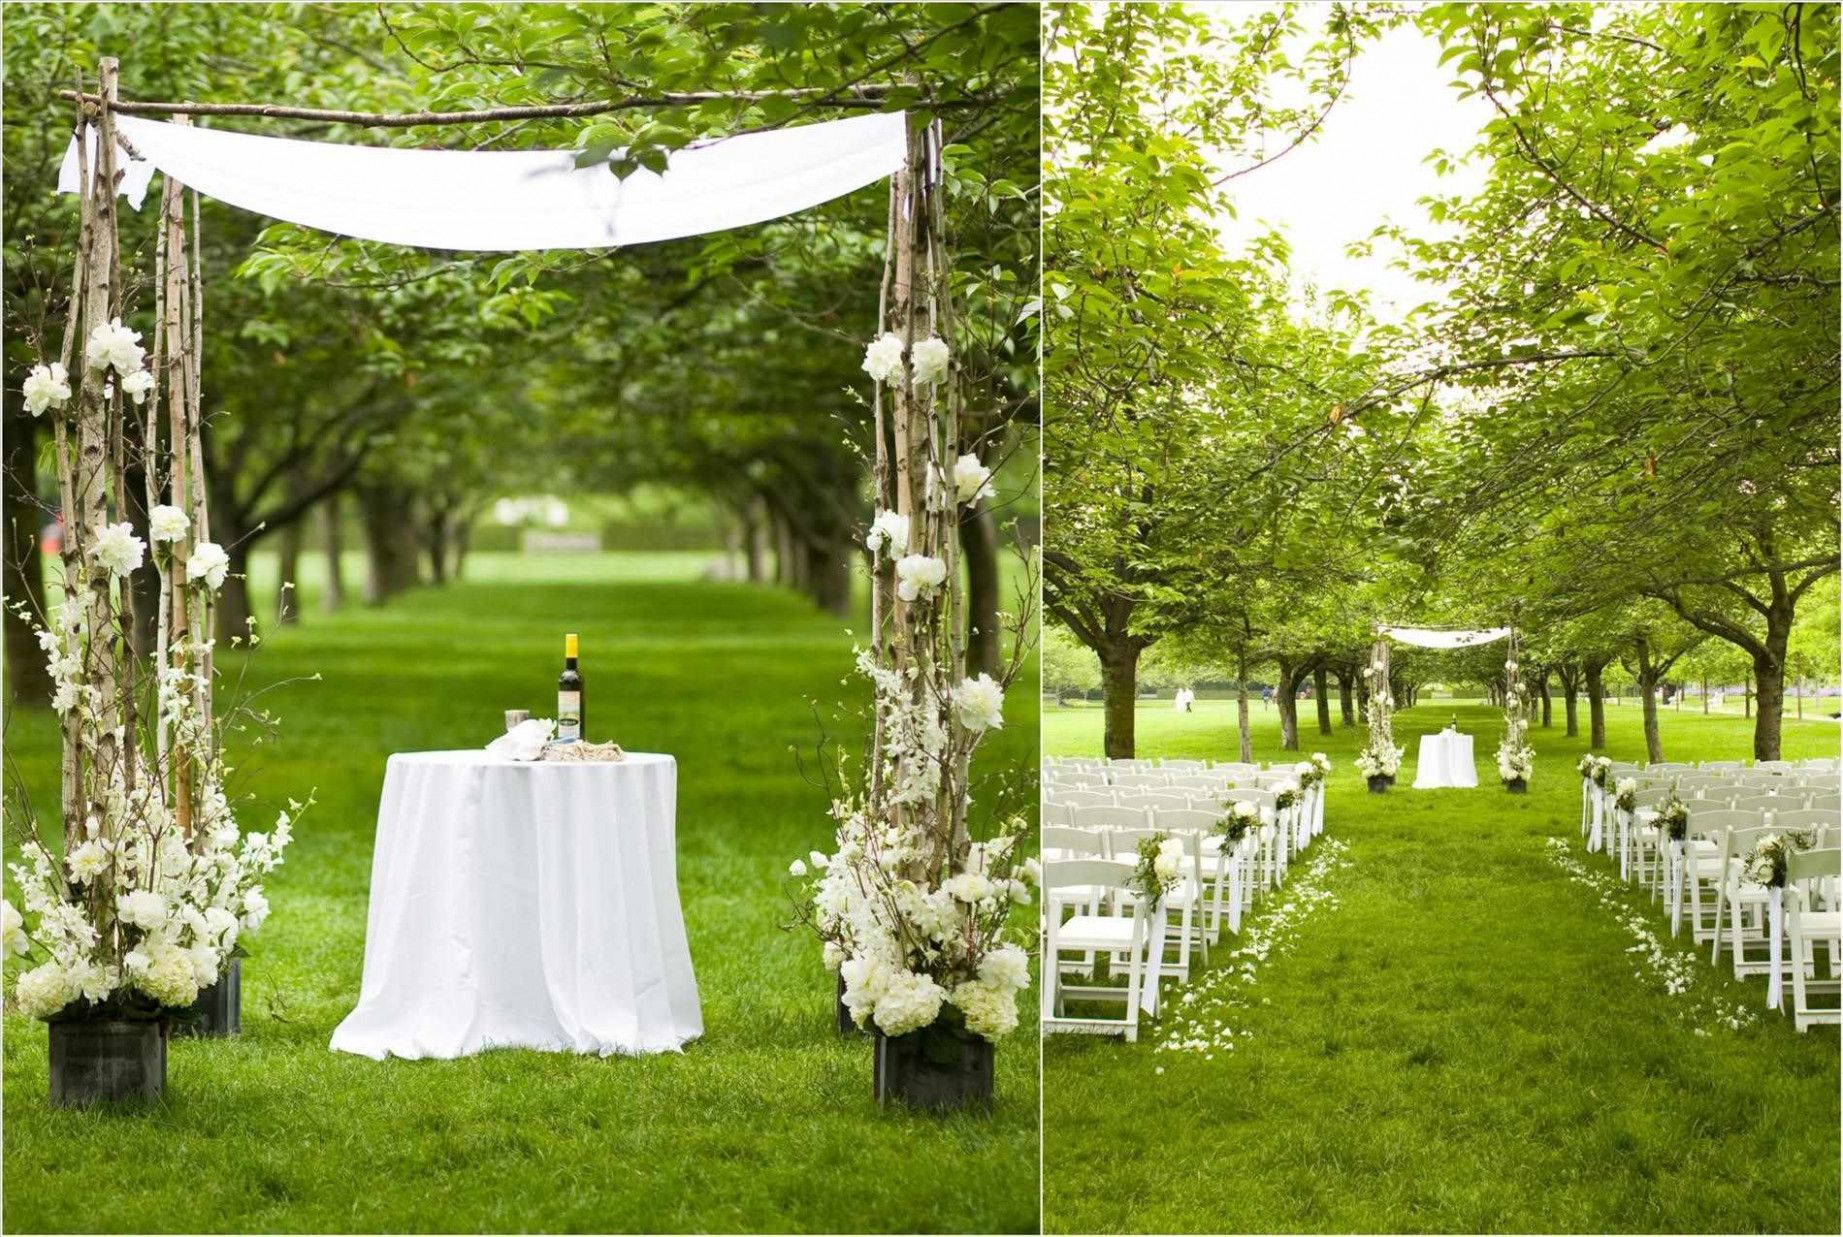 Wedding Ideas On A Budget Colors Simple | Cheap wedding ...